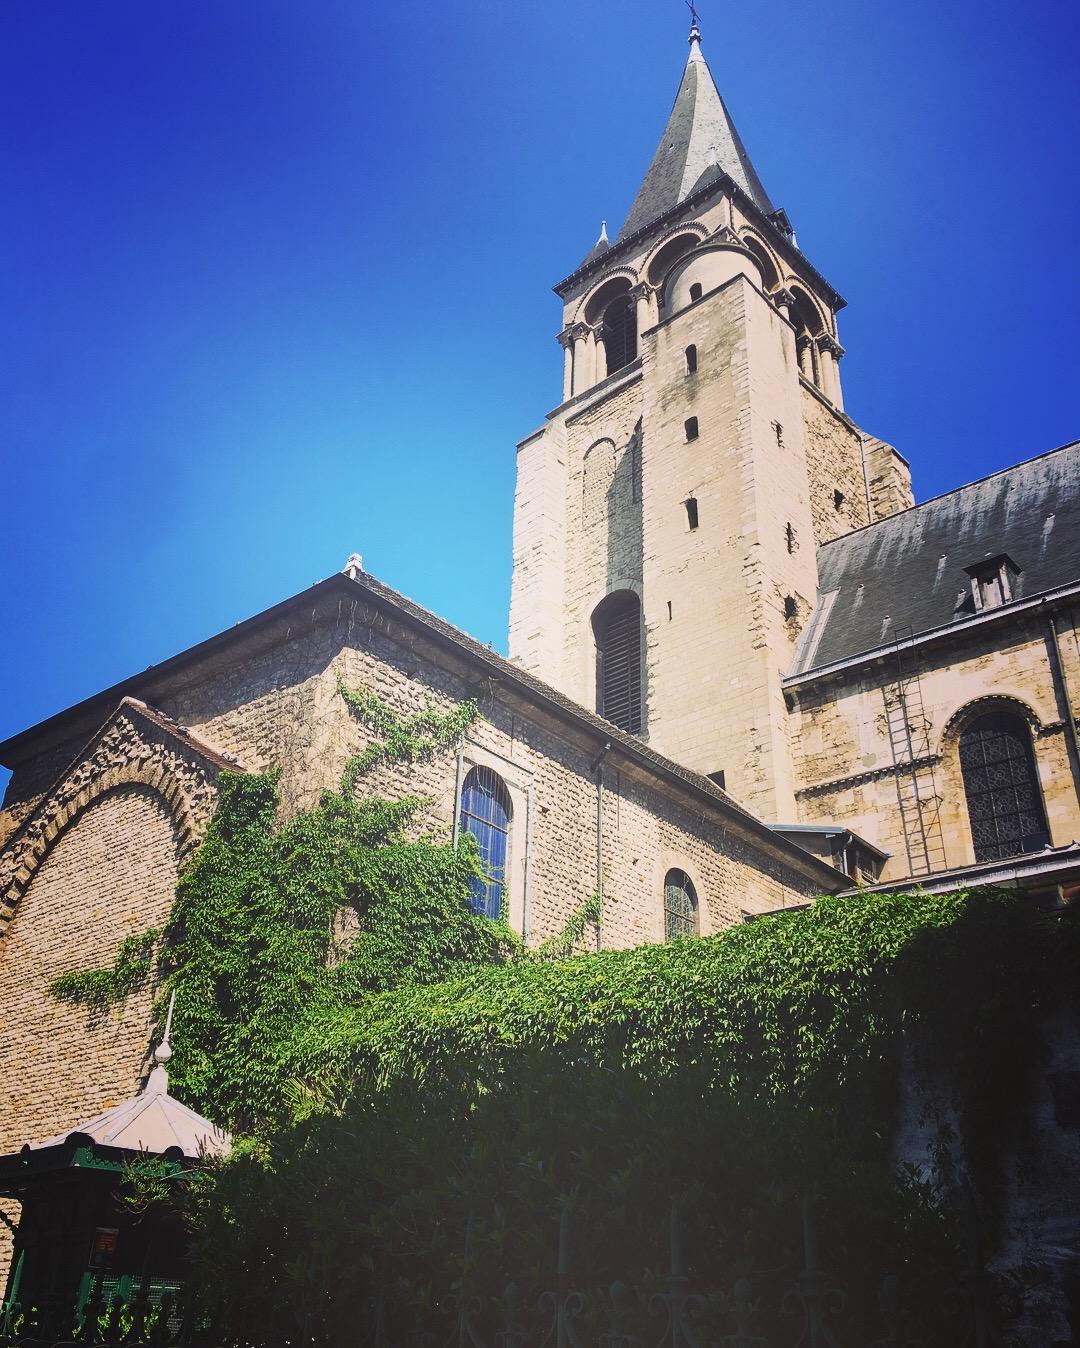 Saint Germaine Cathedral